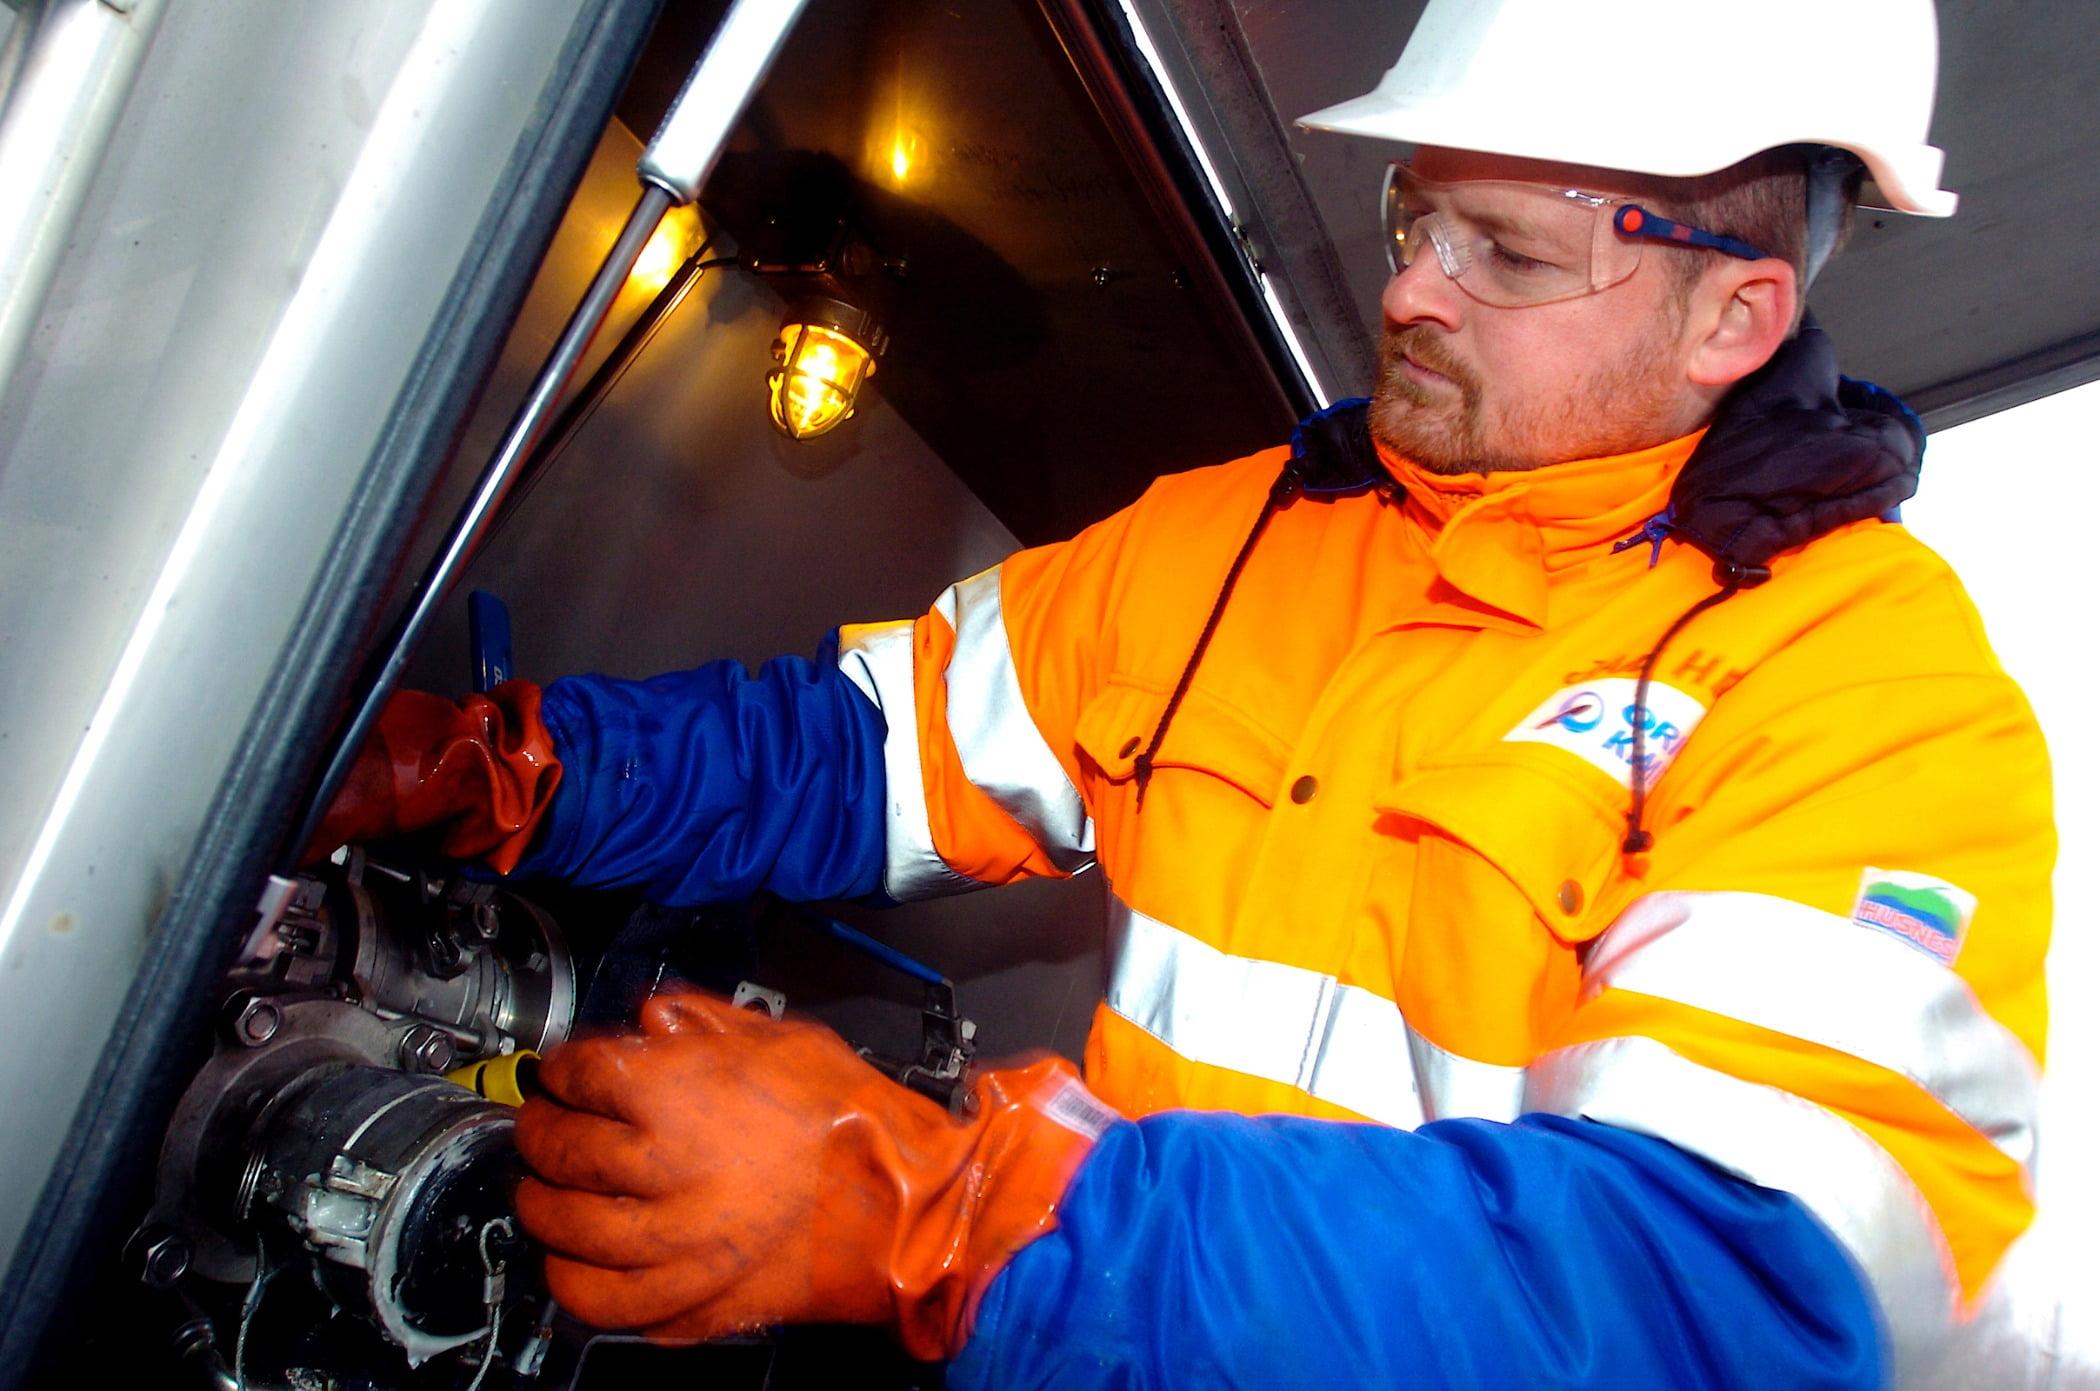 High-visibility clothing, Automotive lighting, Workwear, Helmet, Vehicle, Sleeve, Gesture, Hood, Engineer